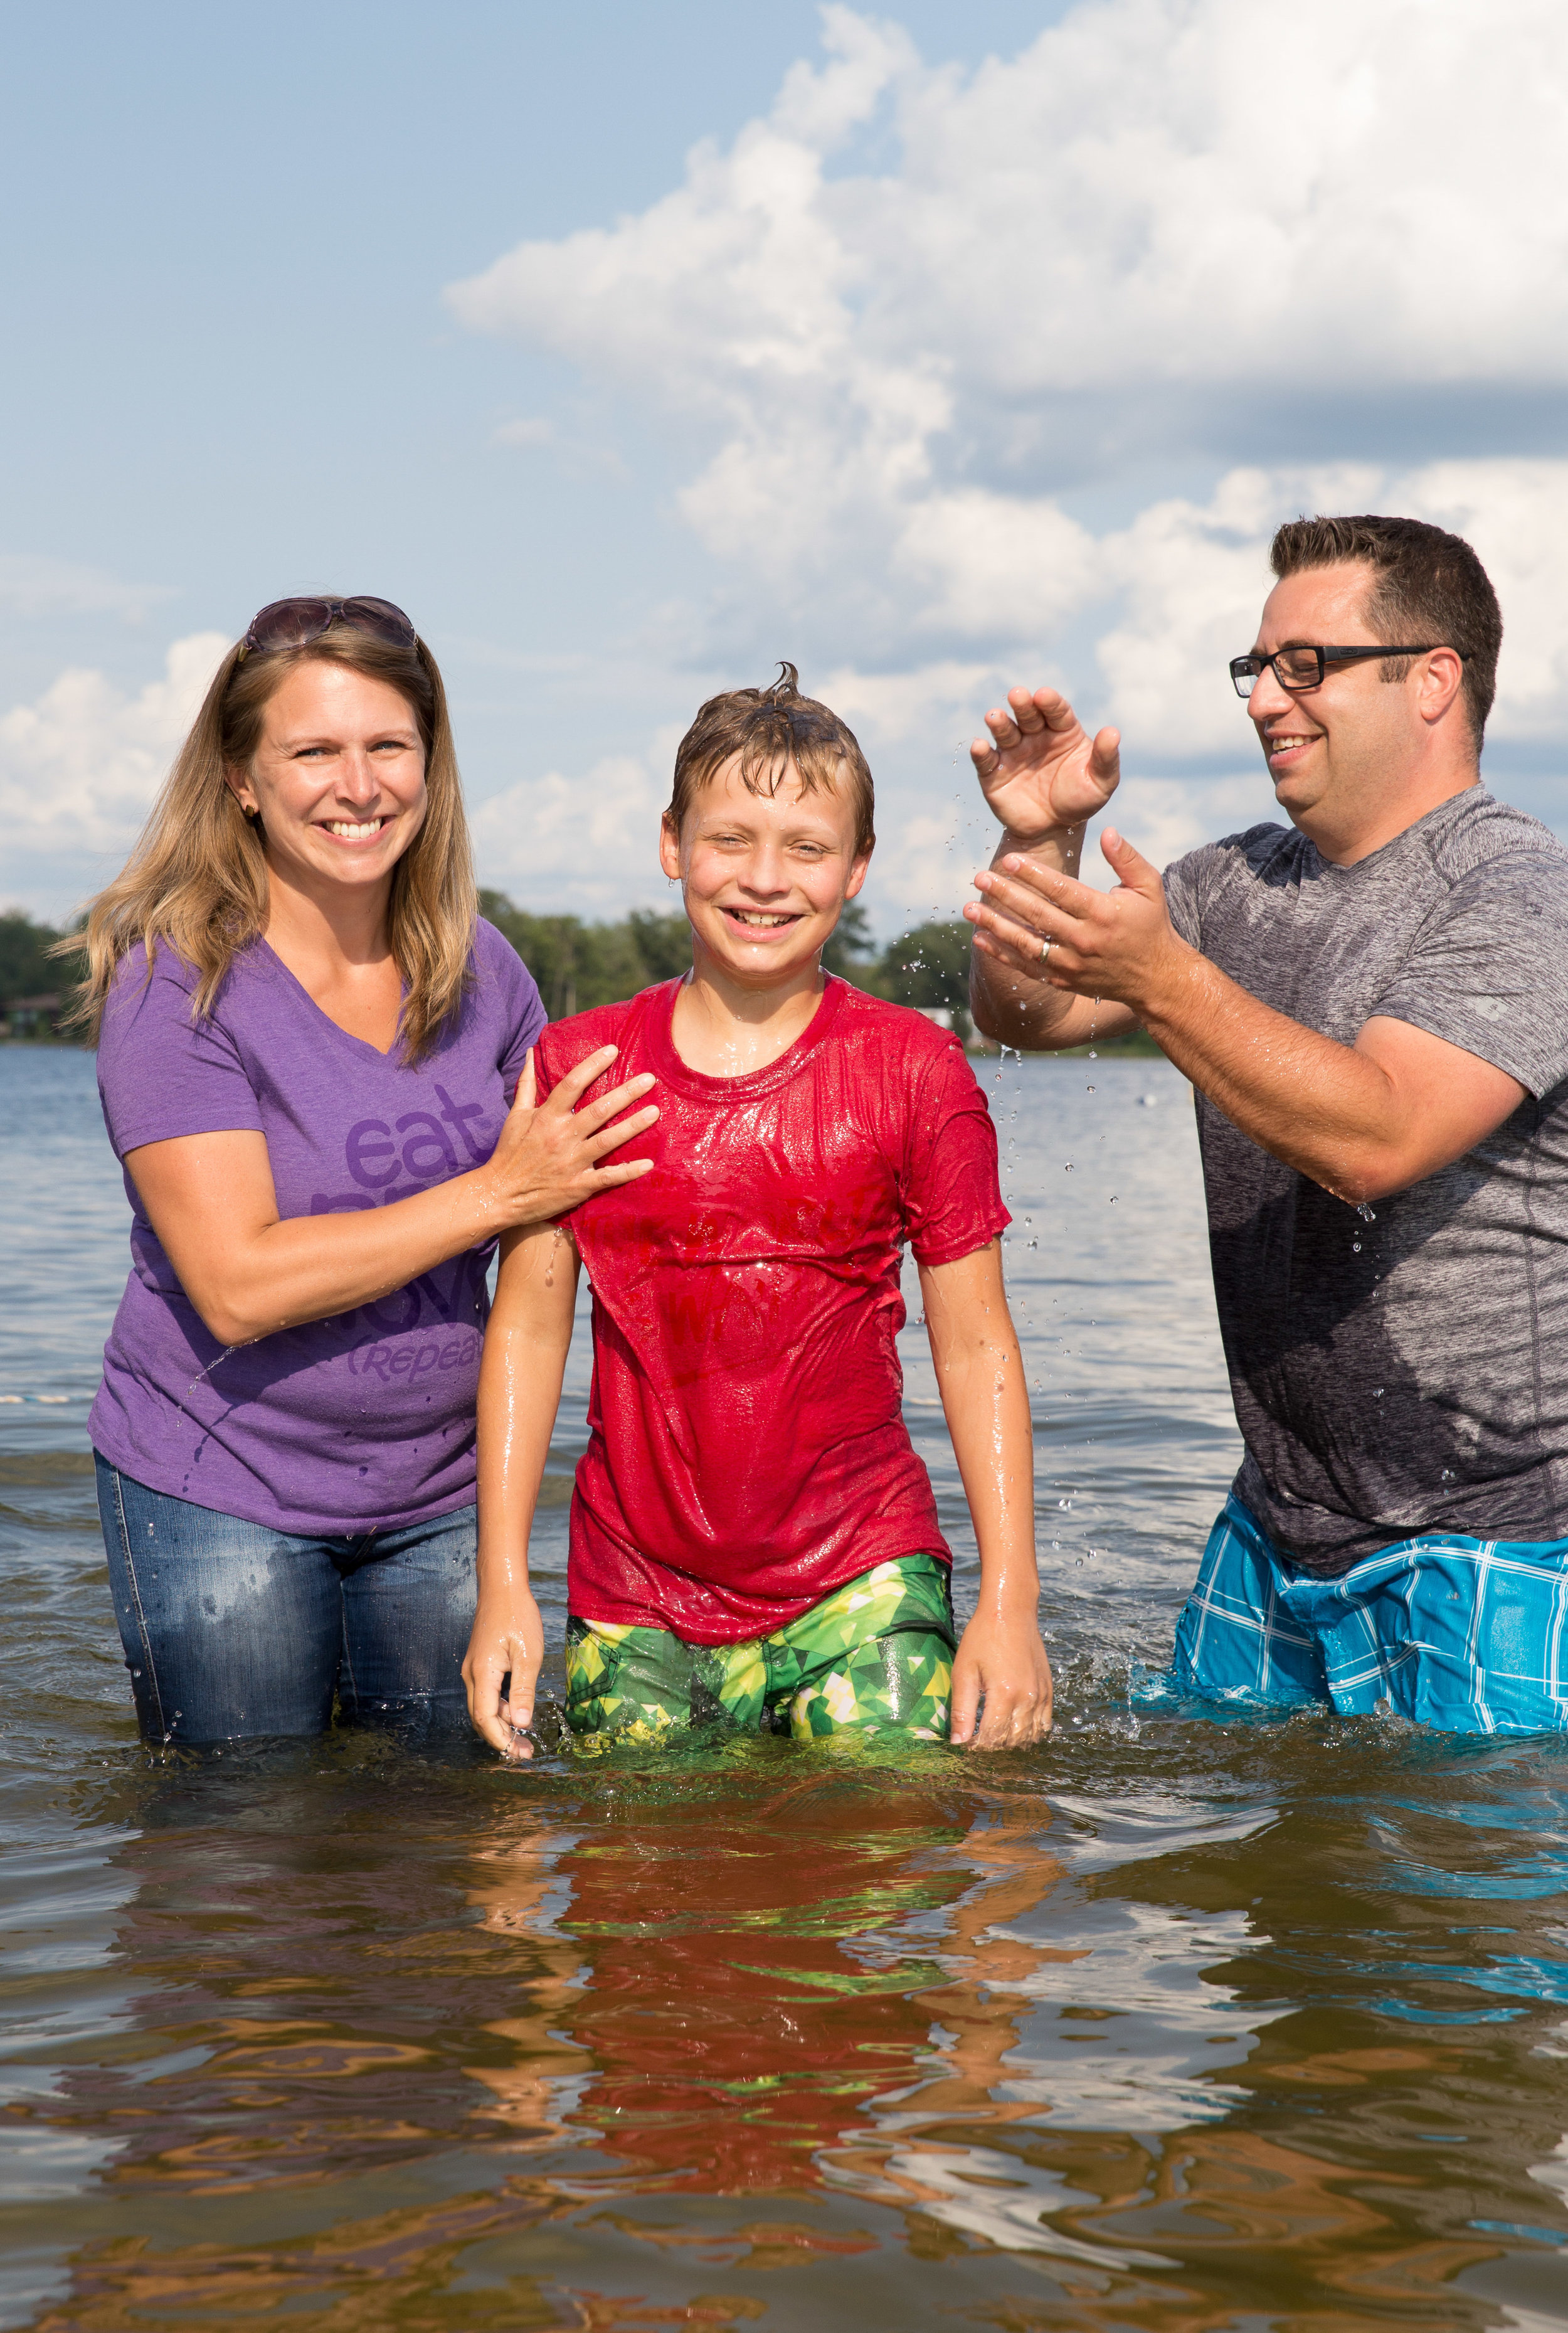 Baptism at Lake Lansing_Son with Parents_Tania Howard Photography.jpg